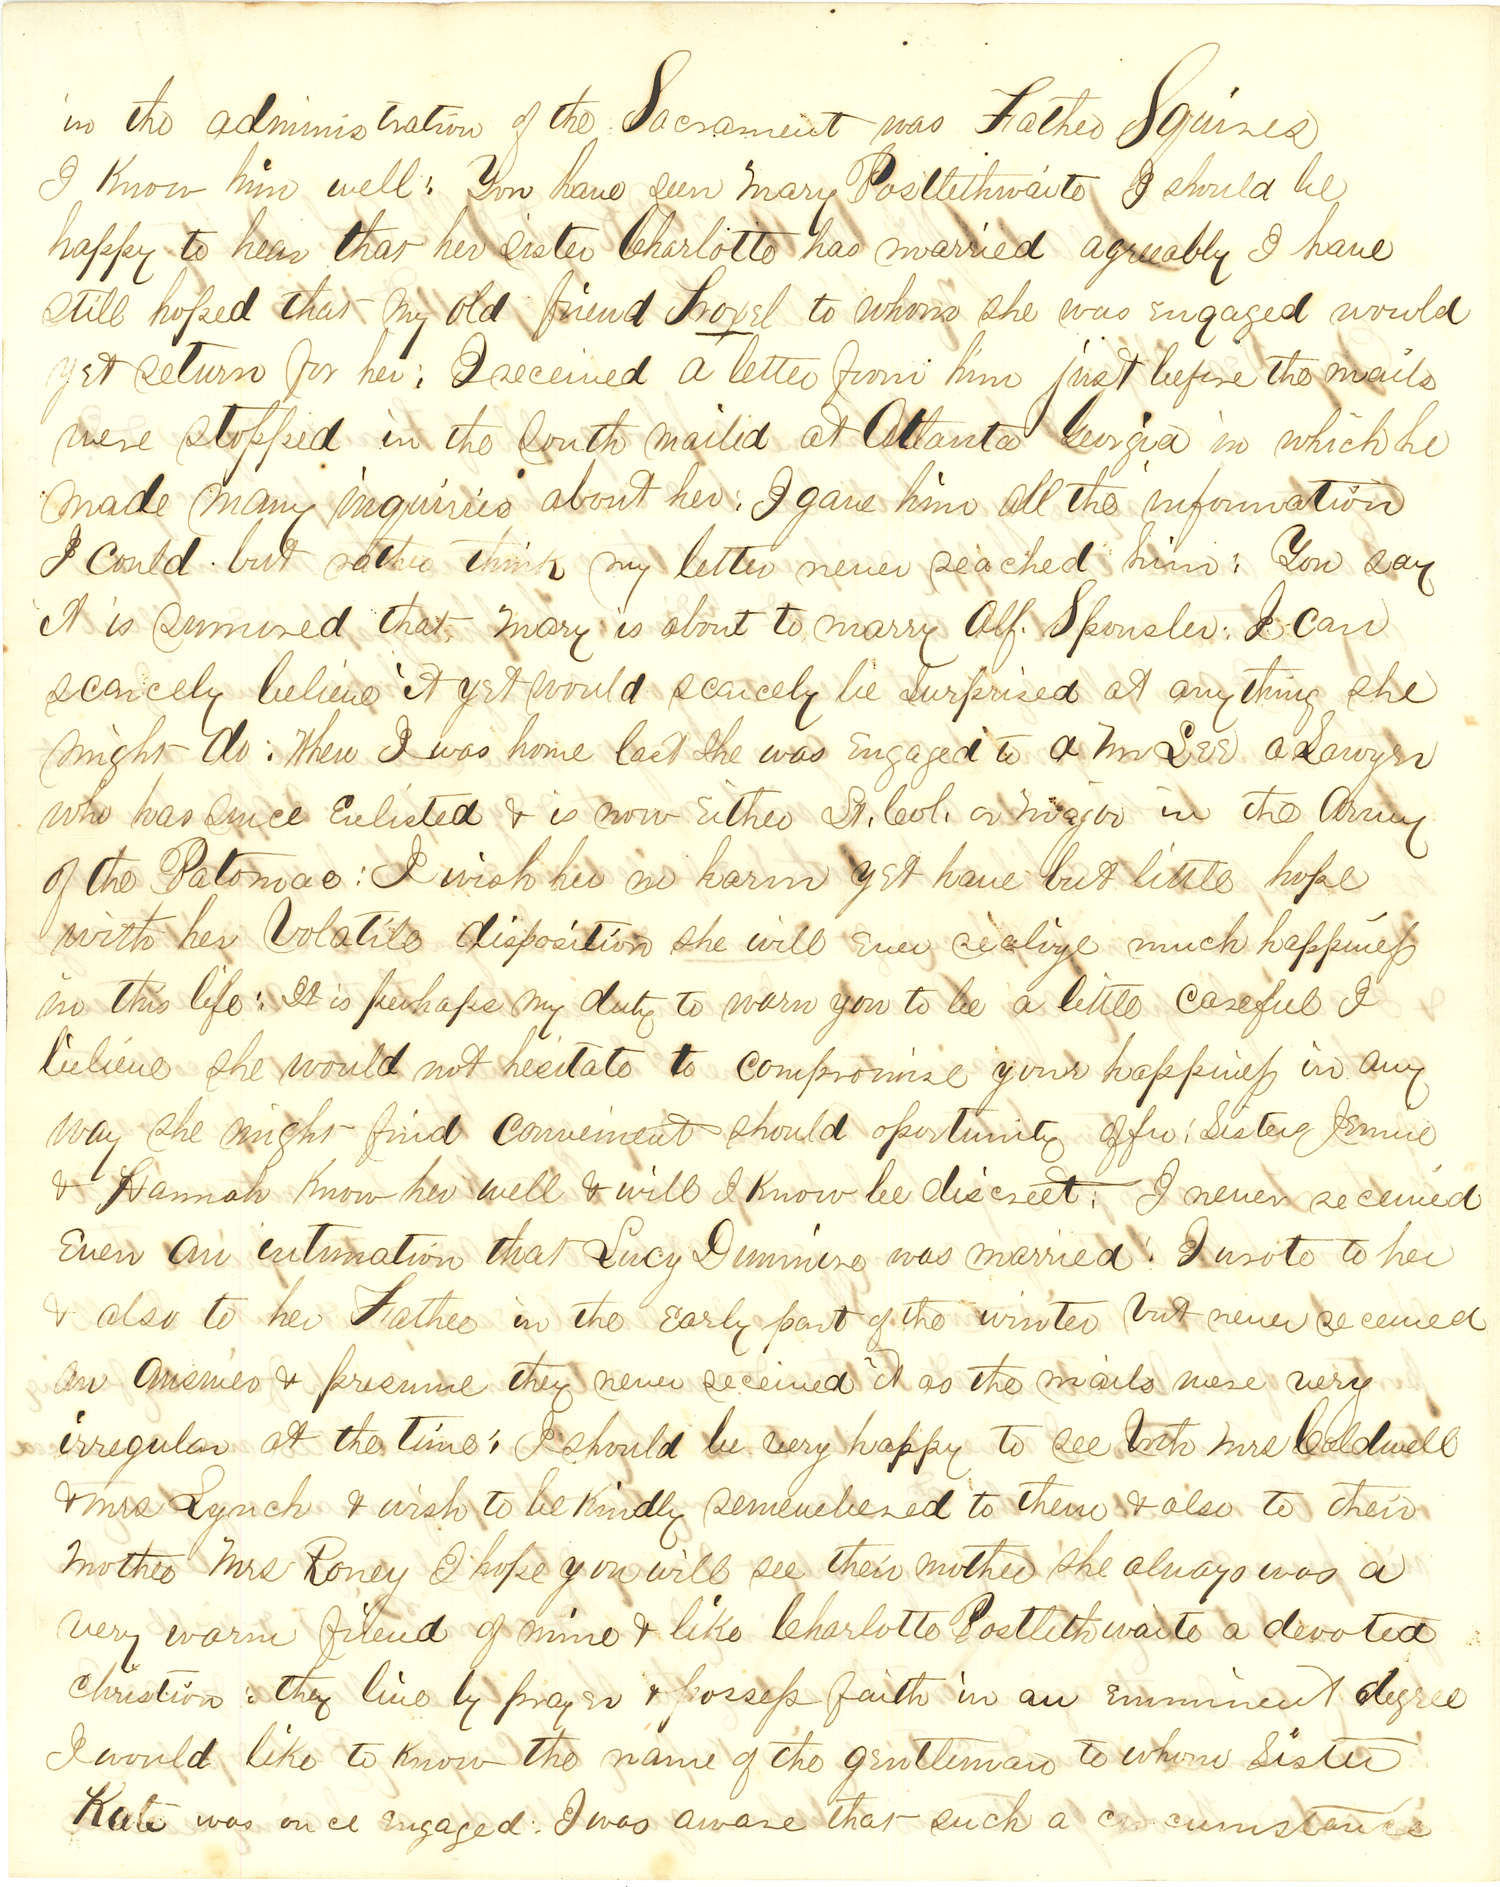 Joseph Culver Letter, September 14, 1863, Page 2